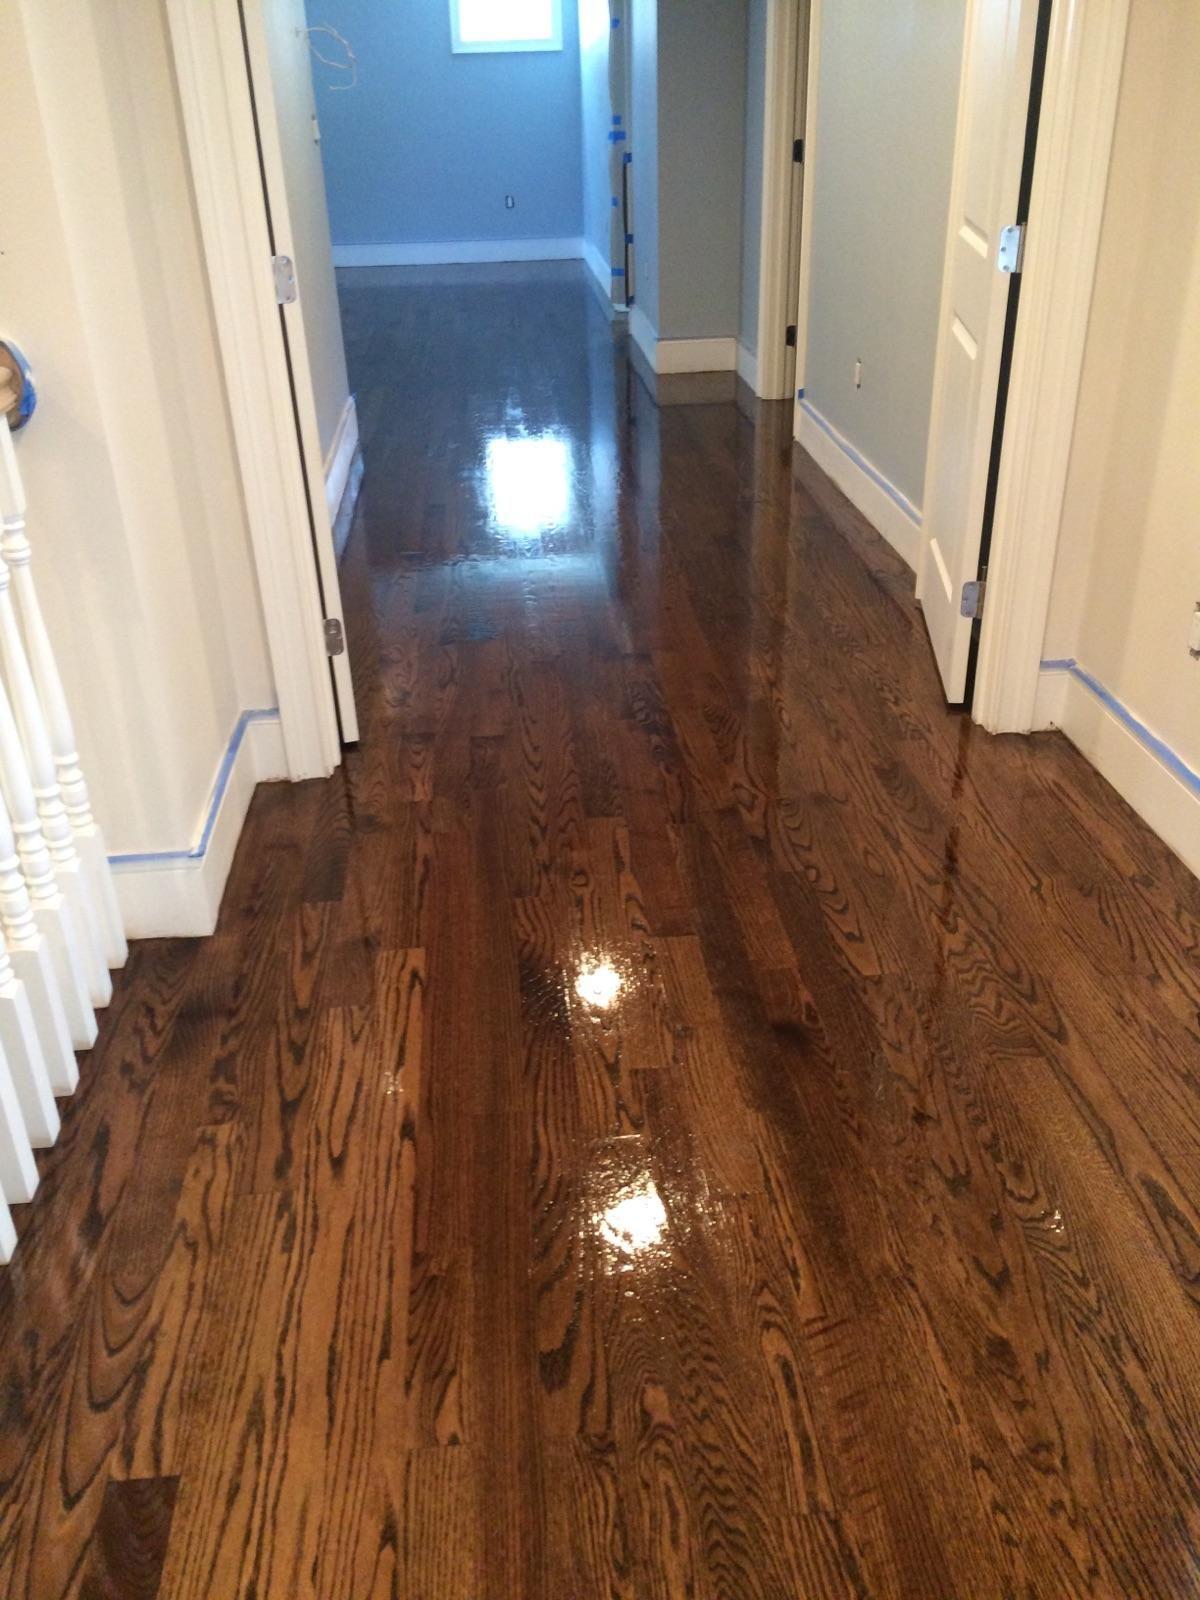 Oak Wood Floors Accent Gray Walls Highlighting A White: Central Mass Hardwood Installed Brand New Red Oak Hardwood